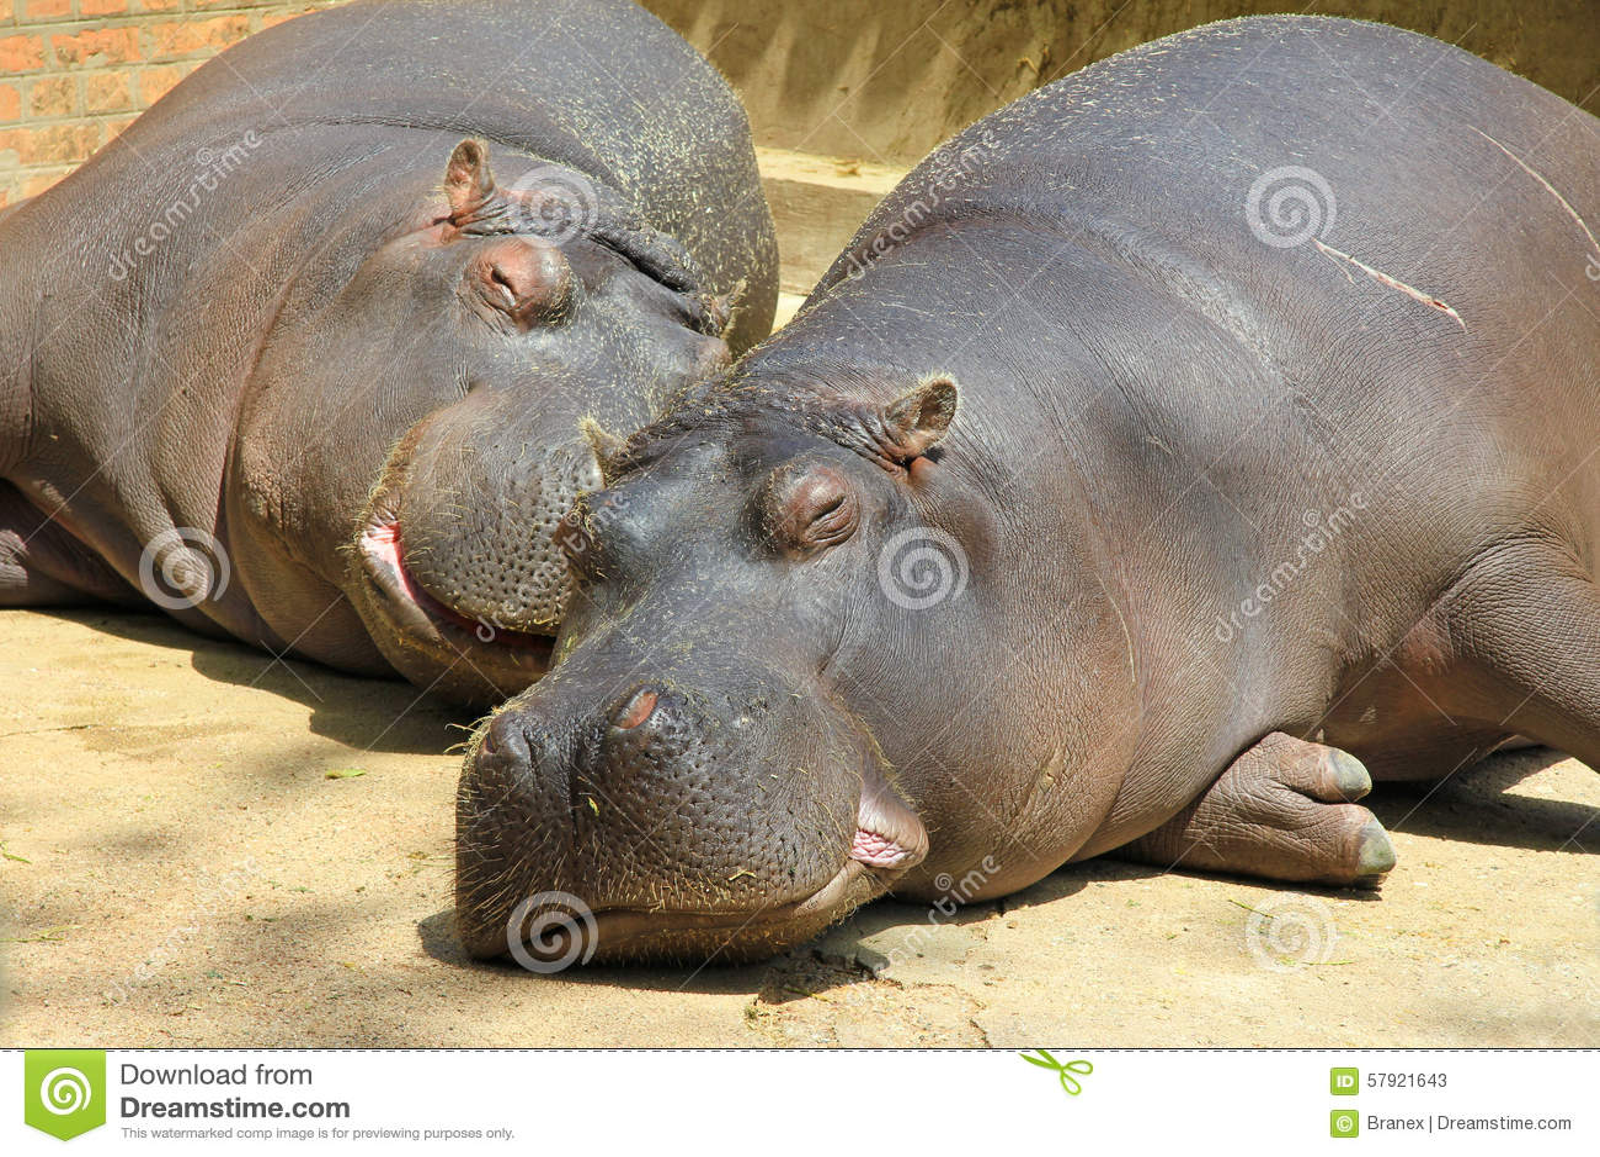 Fat hippo and a small gorilla - 1 part 1